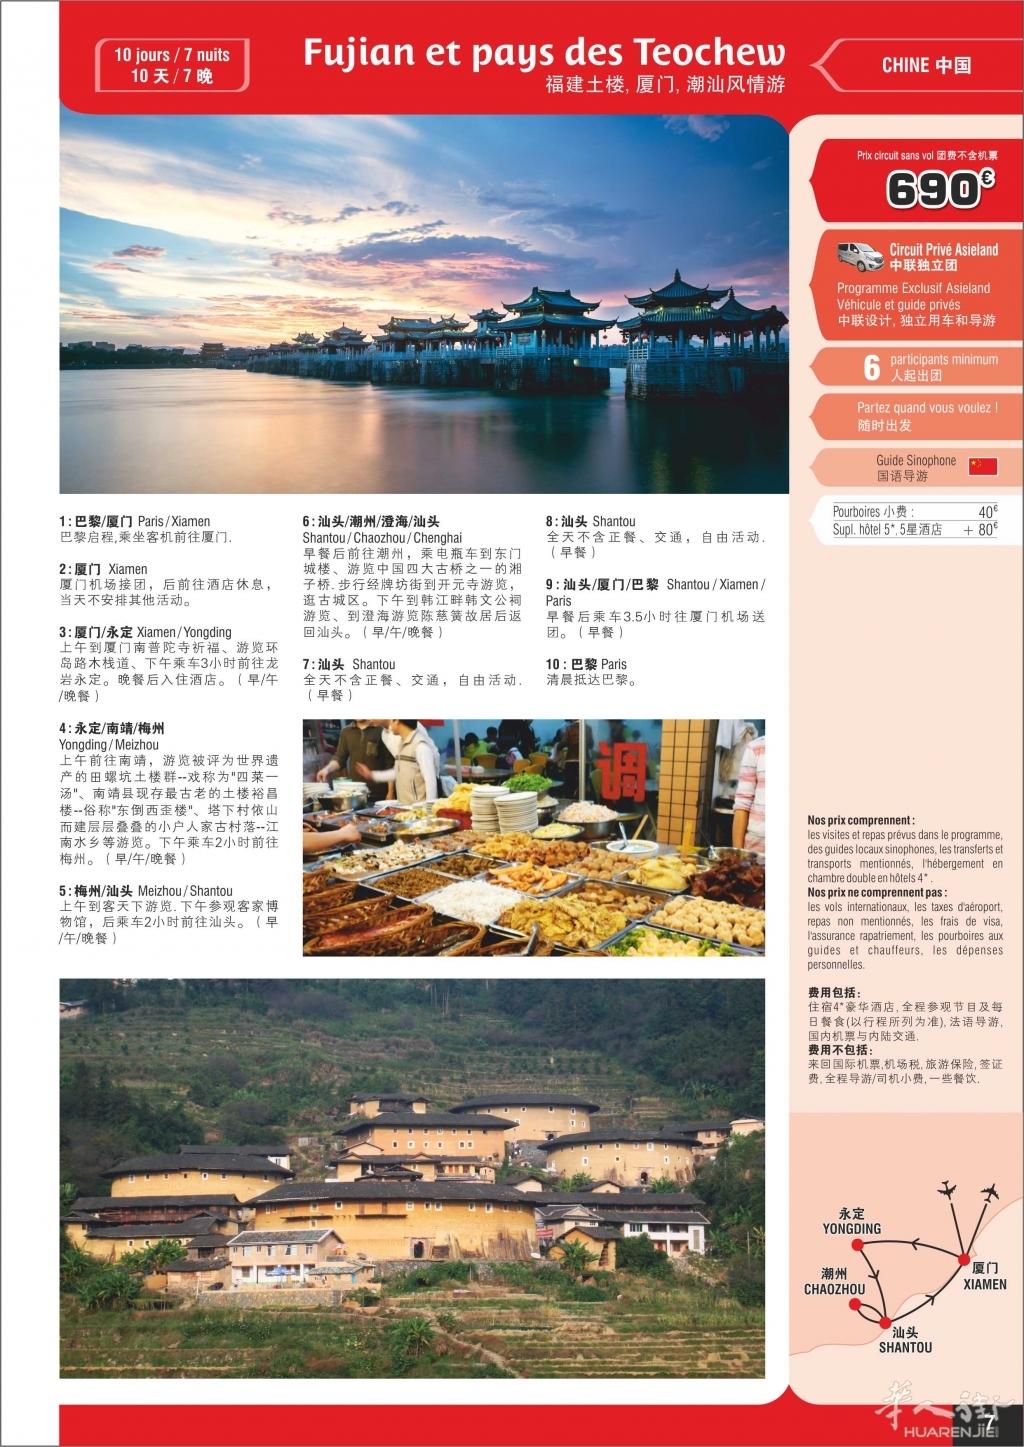 p07-Fujian et pays des Teochew-10j-v06.jpg